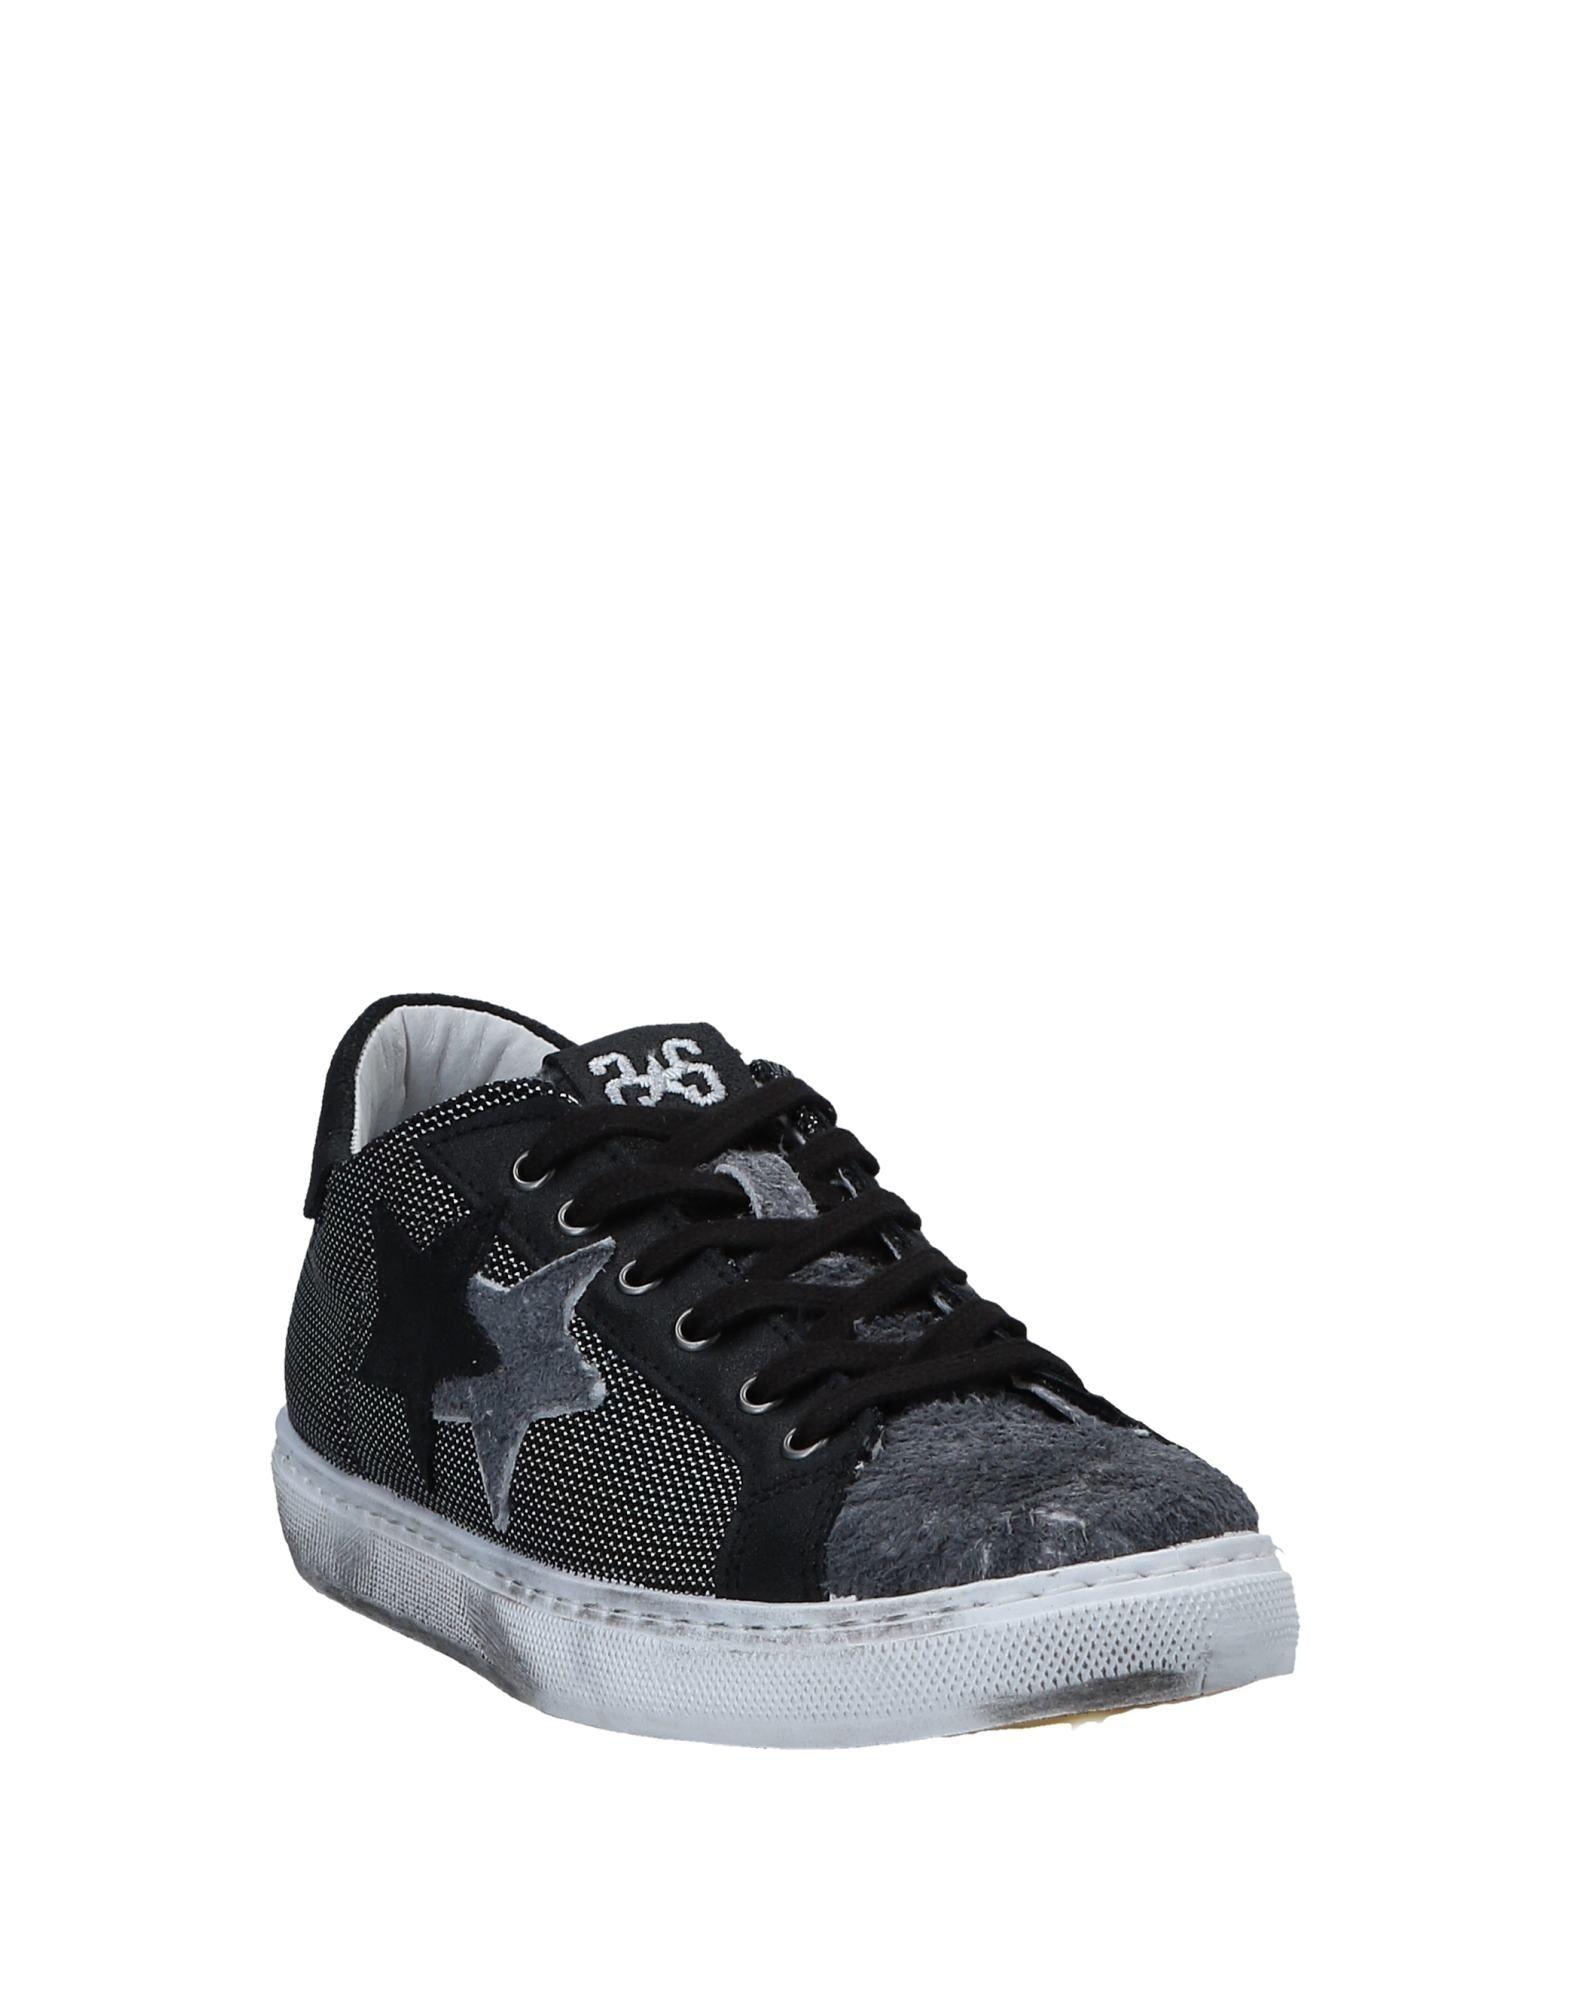 2Star Sneakers - Men  2Star Sneakers online on  Men Australia - 11555262TI 39980e